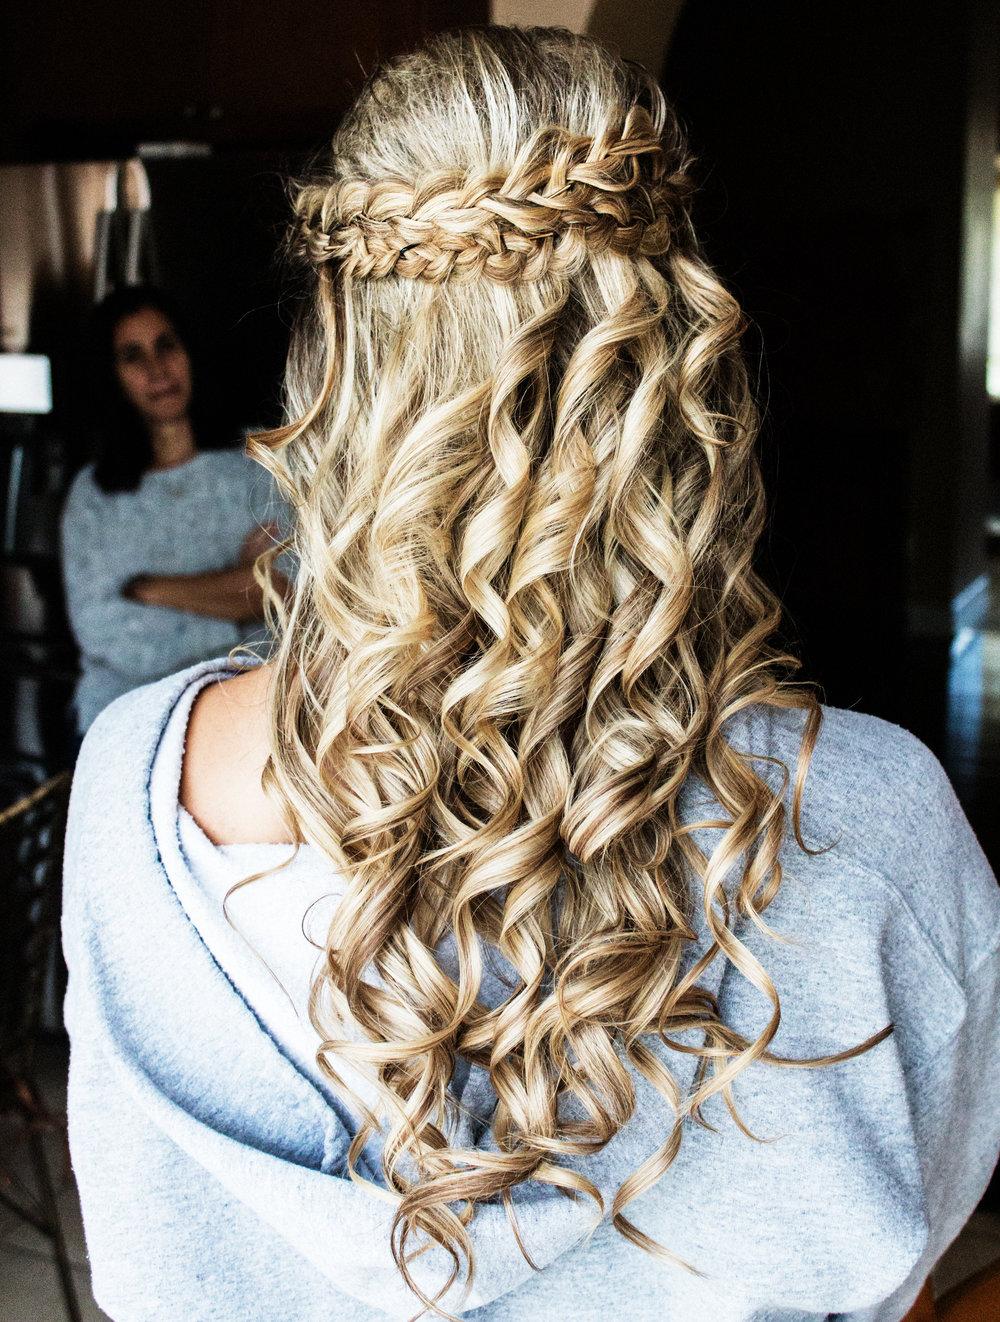 hairstyle promakeupbynatasha.jpg